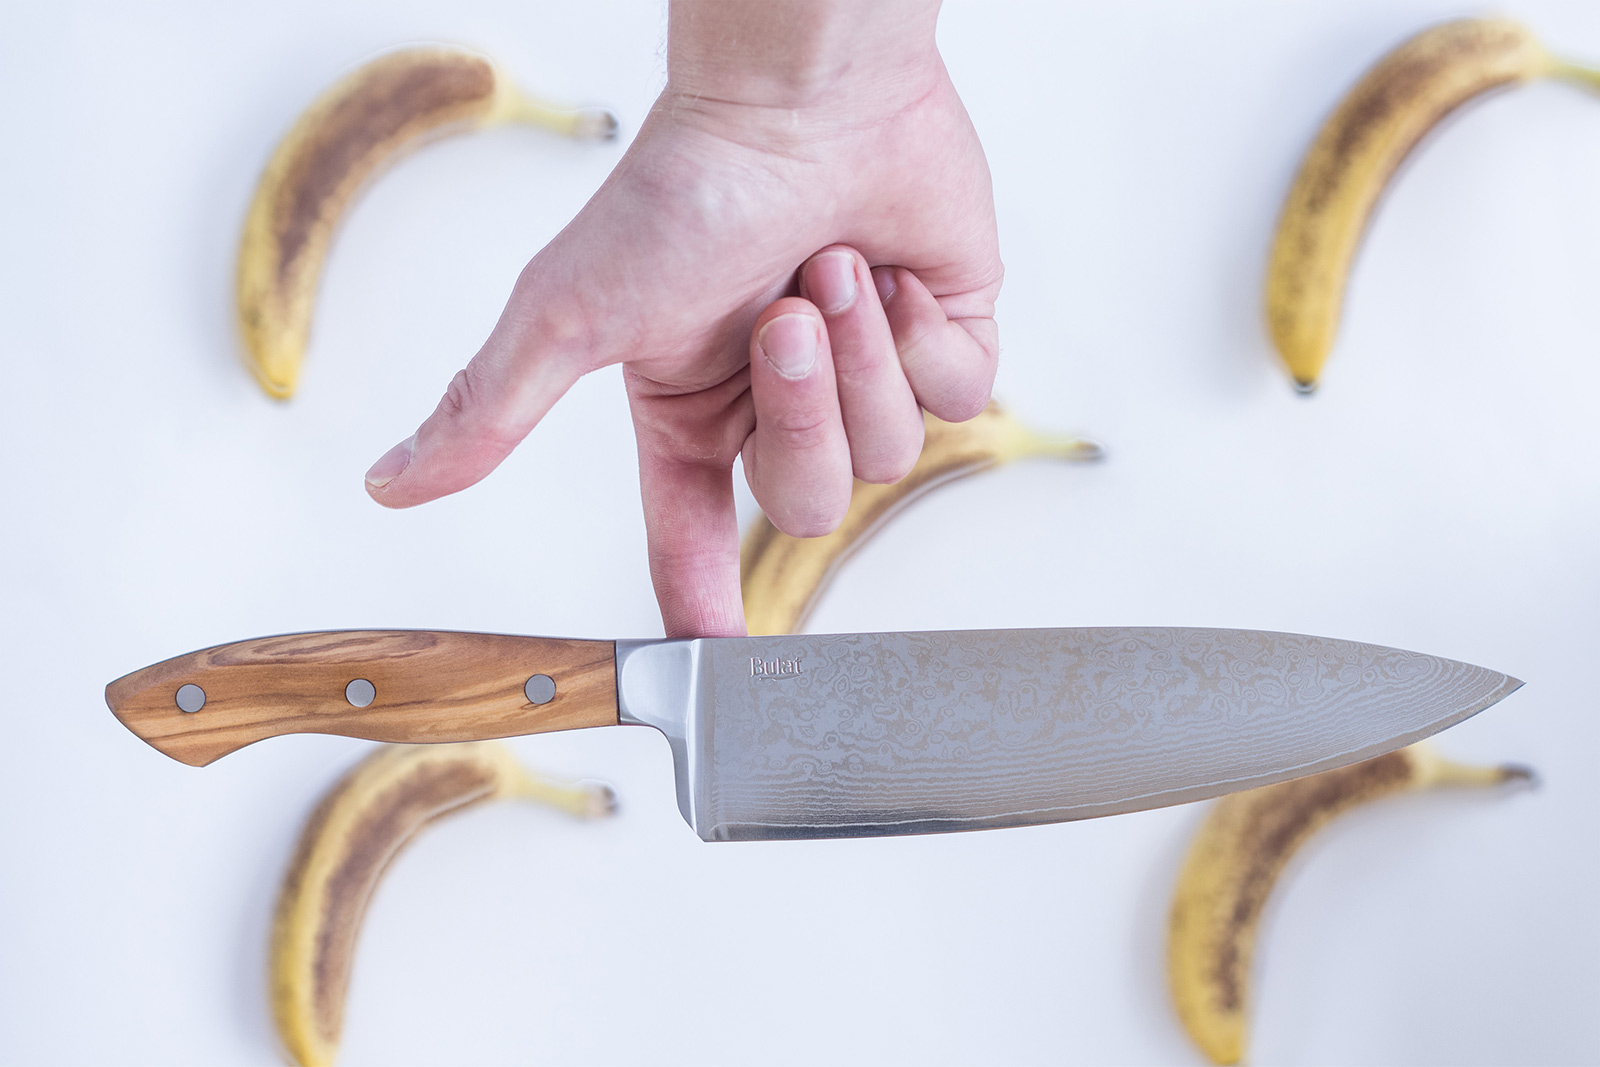 Damascus and bulat knives